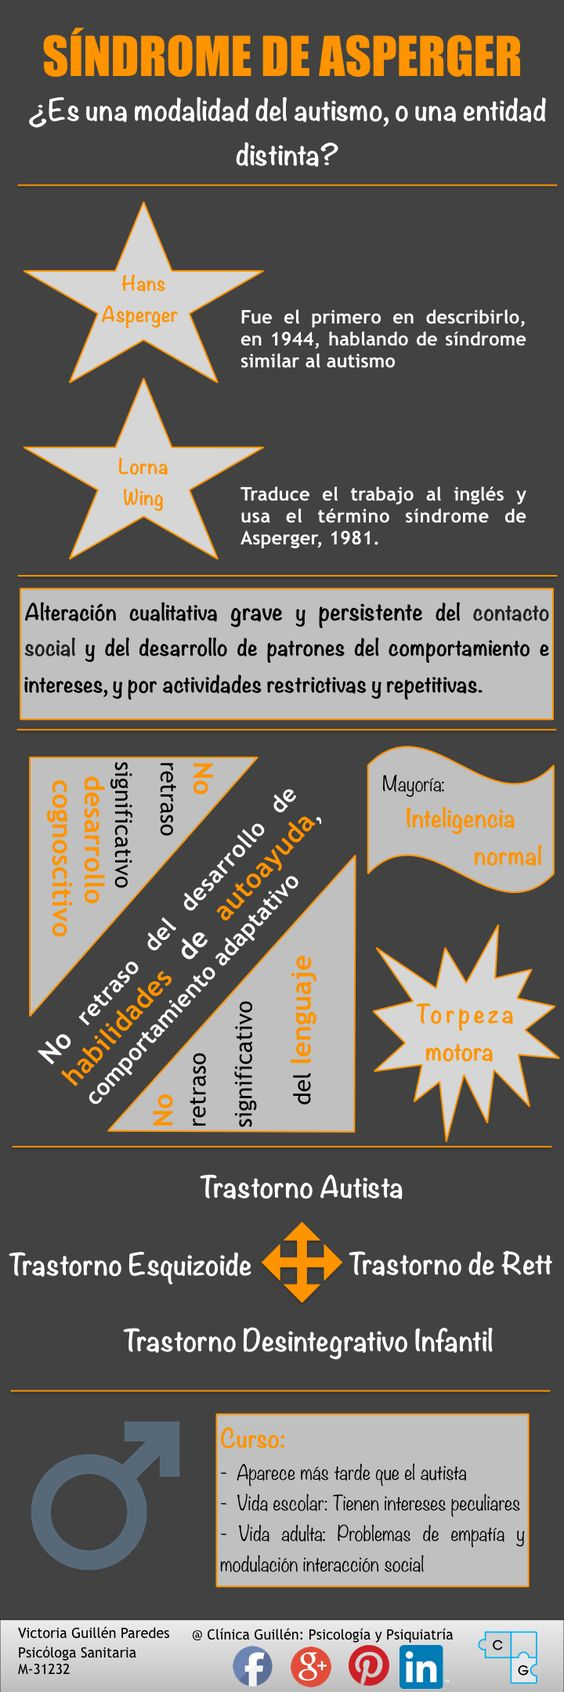 #asperger #trastornosgeneralizadosdeldesarrollo #psicologiainfantil #psicologia